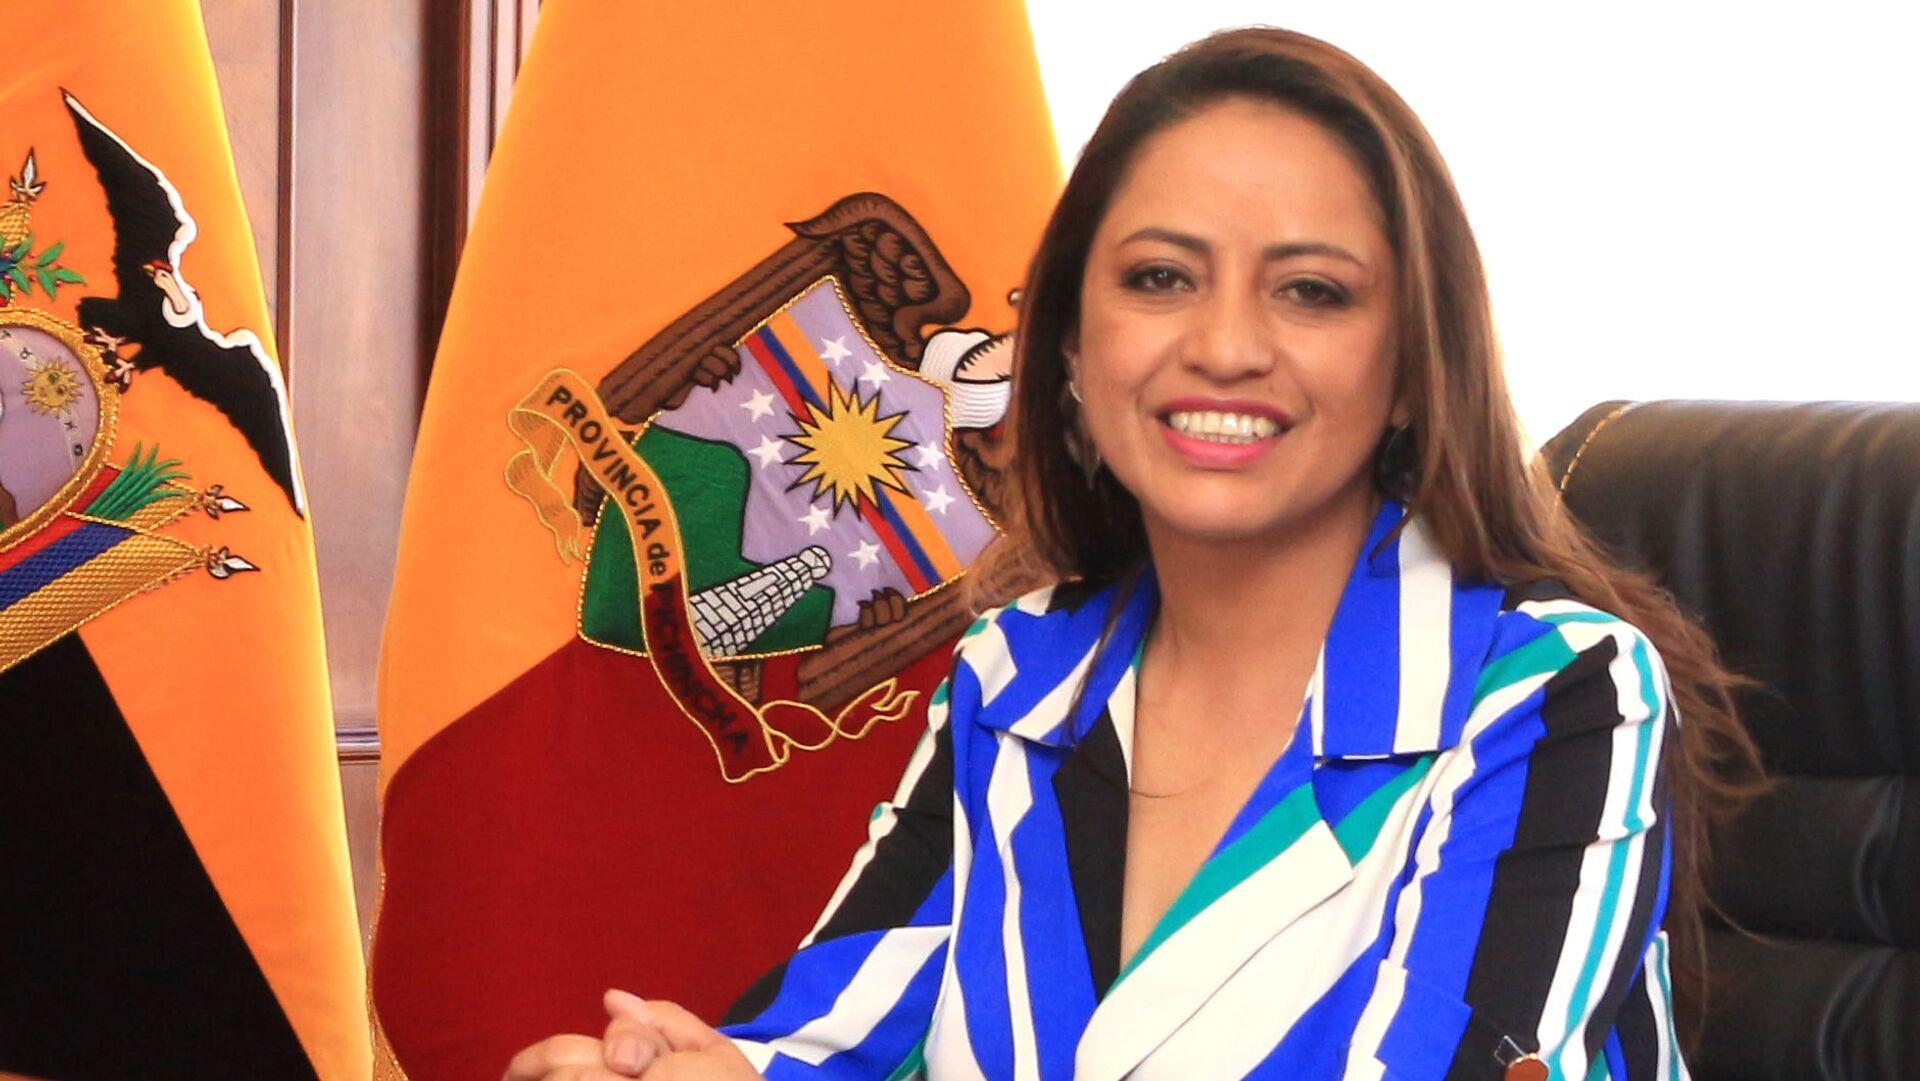 Paola Pabón, prefecta de la provincia ecuatoriana de Pichincha - Sputnik Mundo, 1920, 24.09.2021